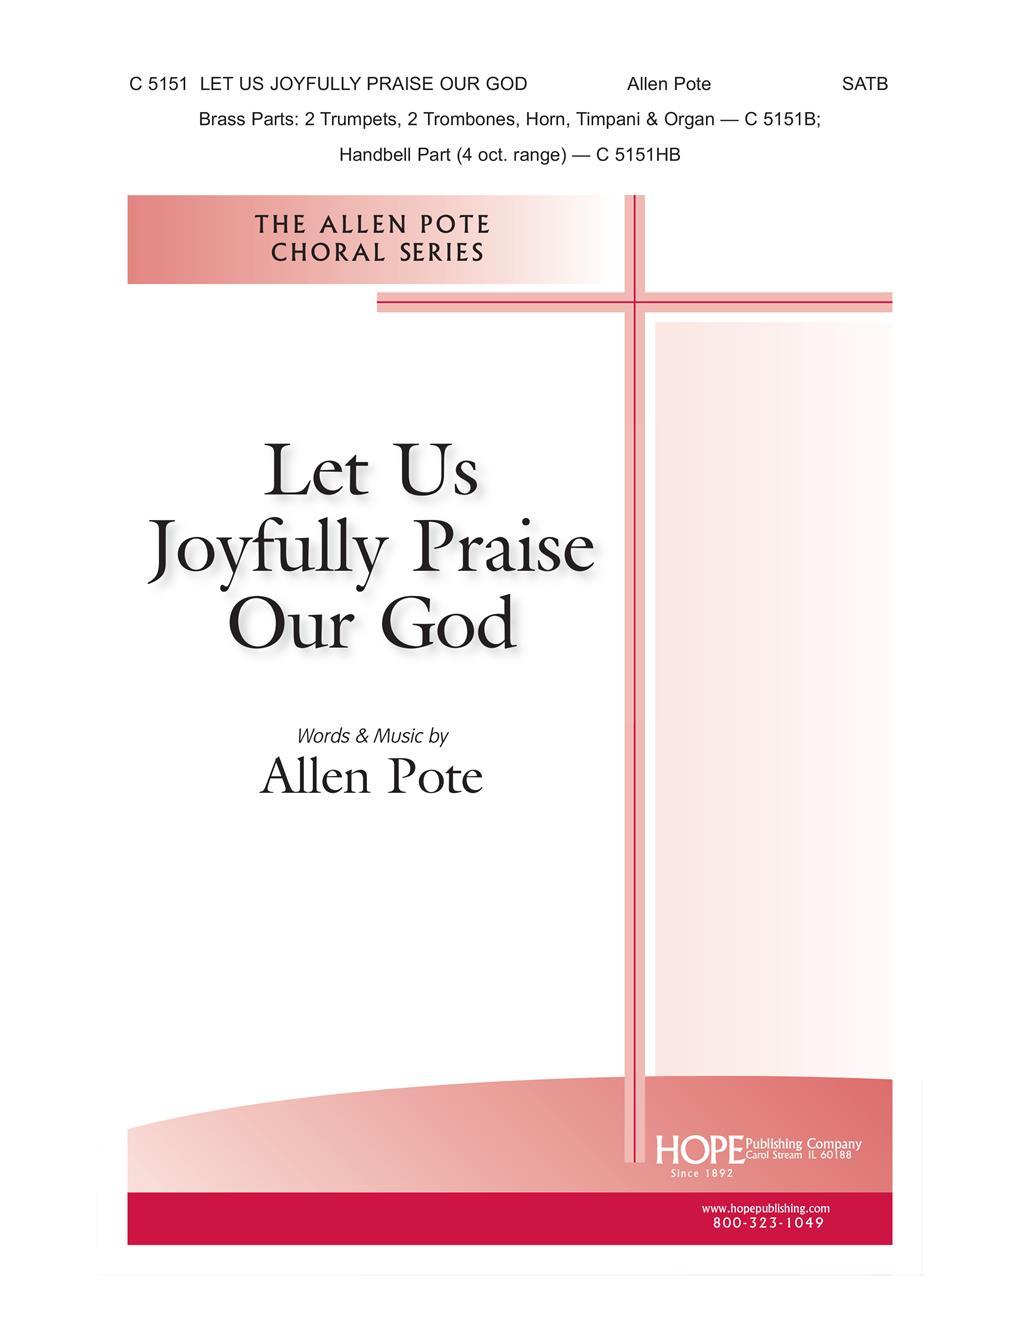 Let Us Joyfully Praise Our God - SATB Cover Image